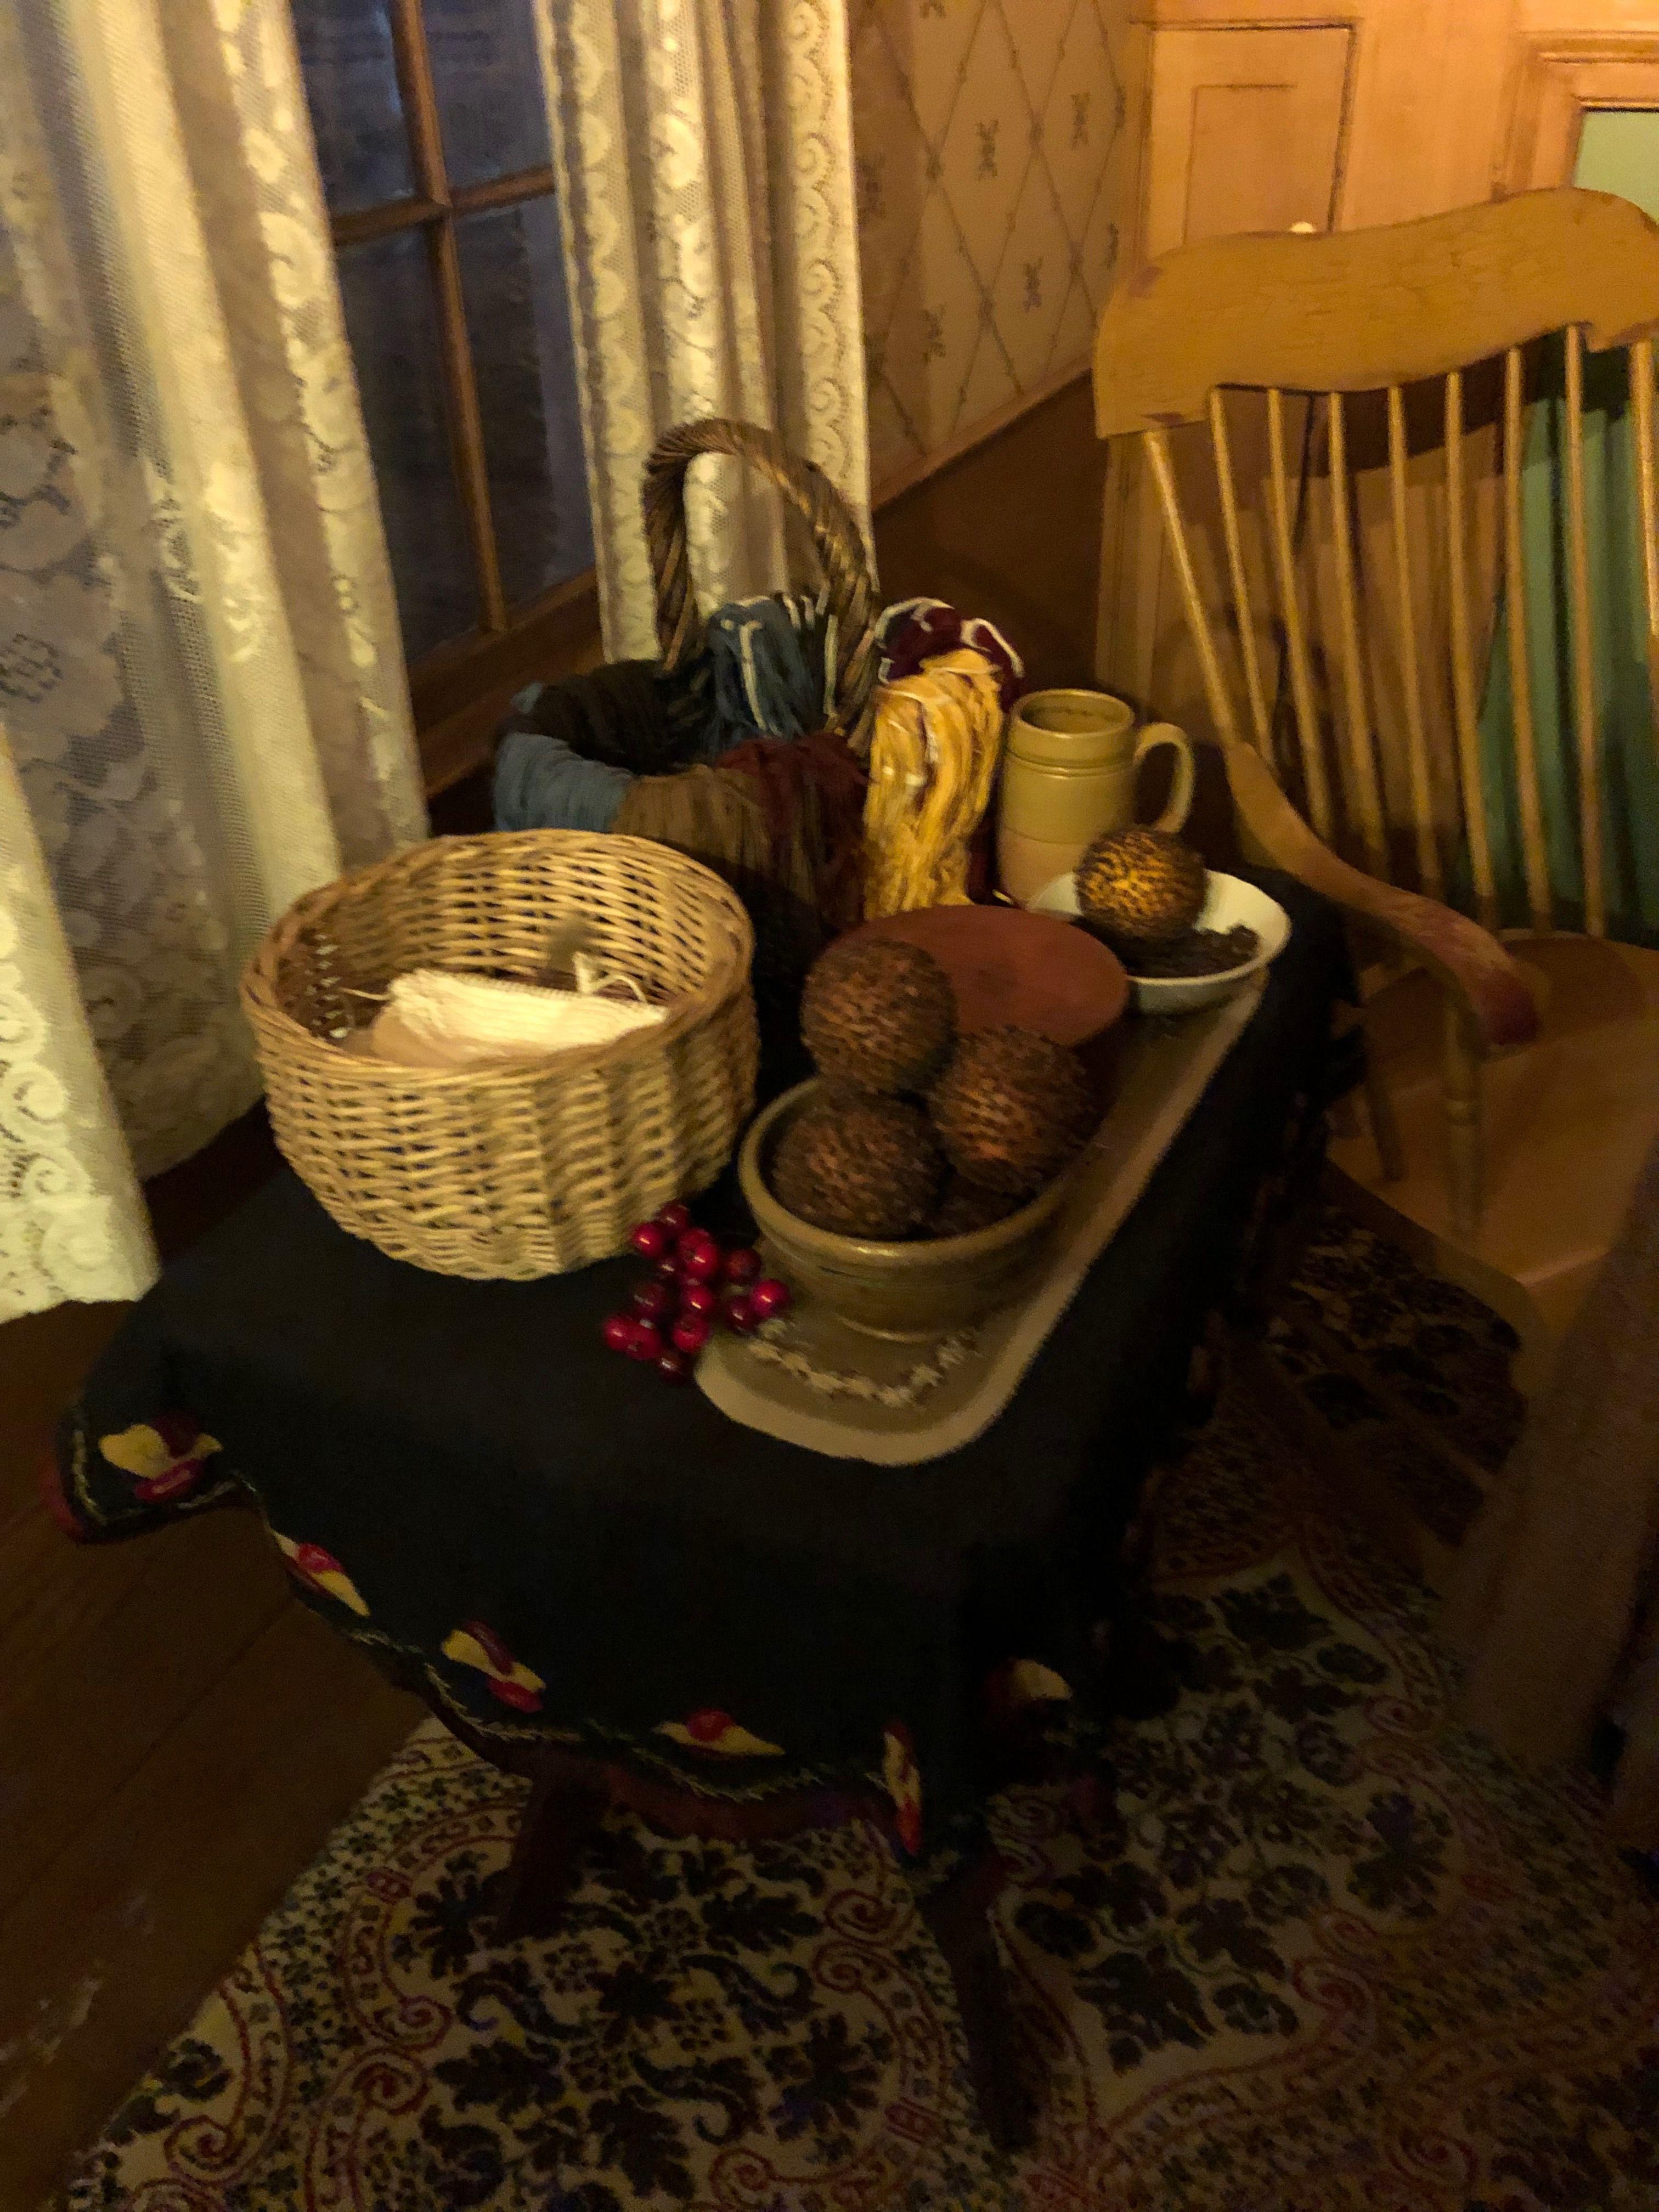 Pin on Plimoth Plantation and Jamestown/Living History